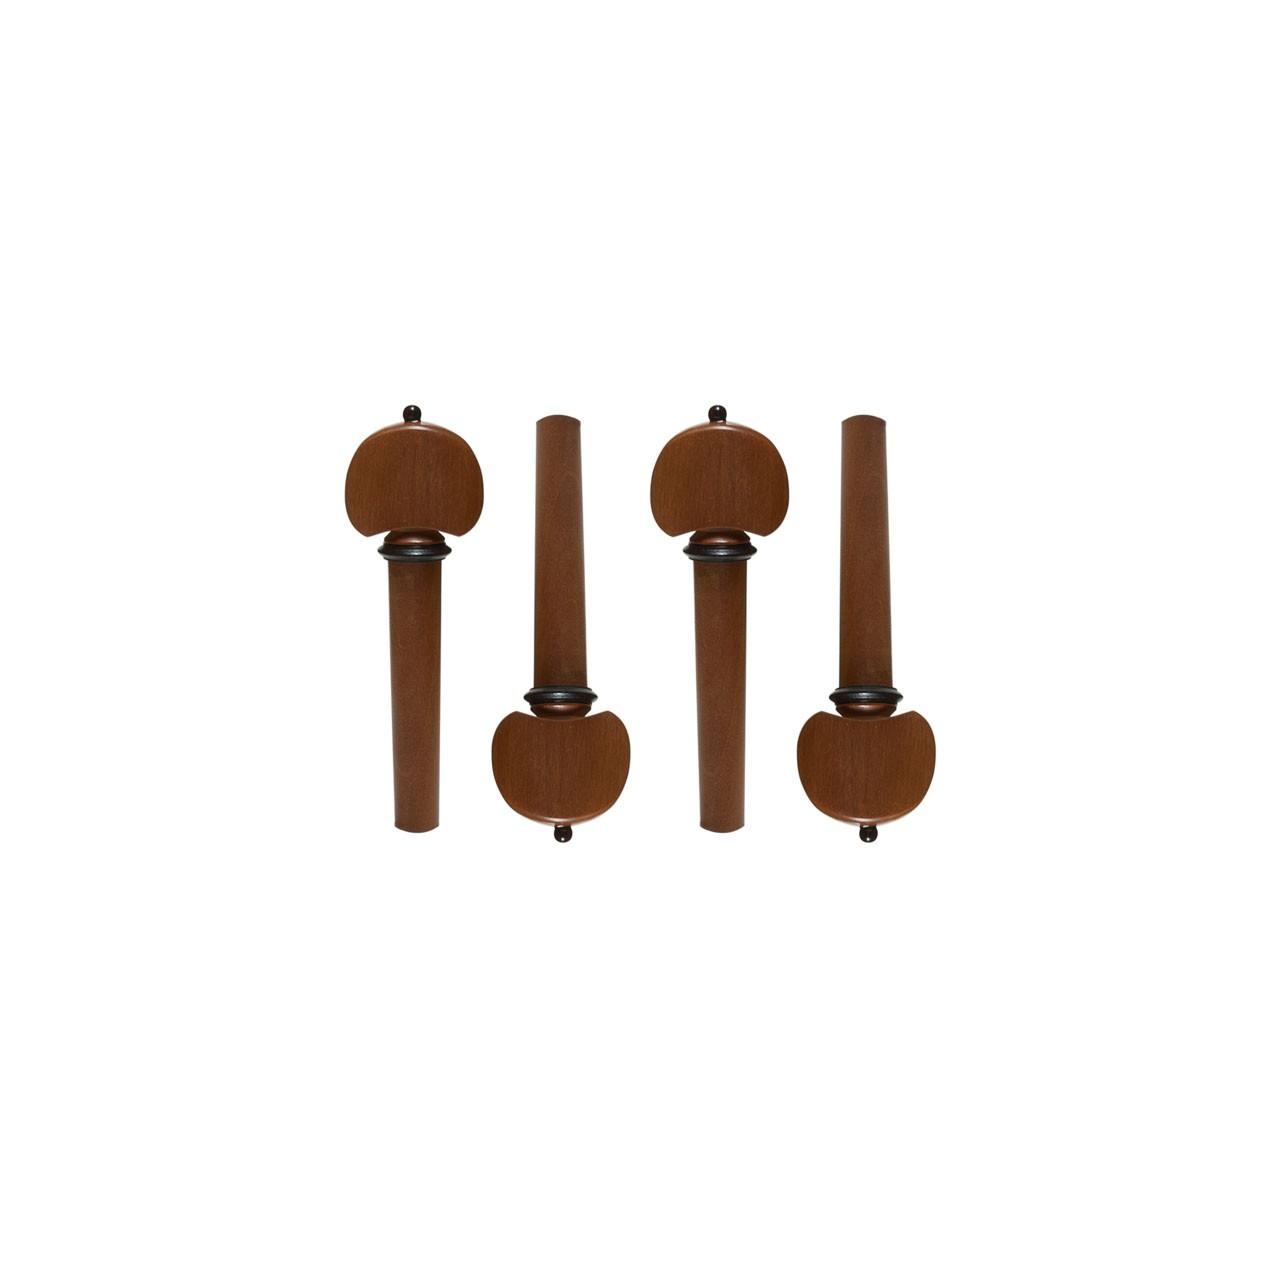 4 Cravelha Violino 4/4 BoxWood Hill Preto Dominante - 8338